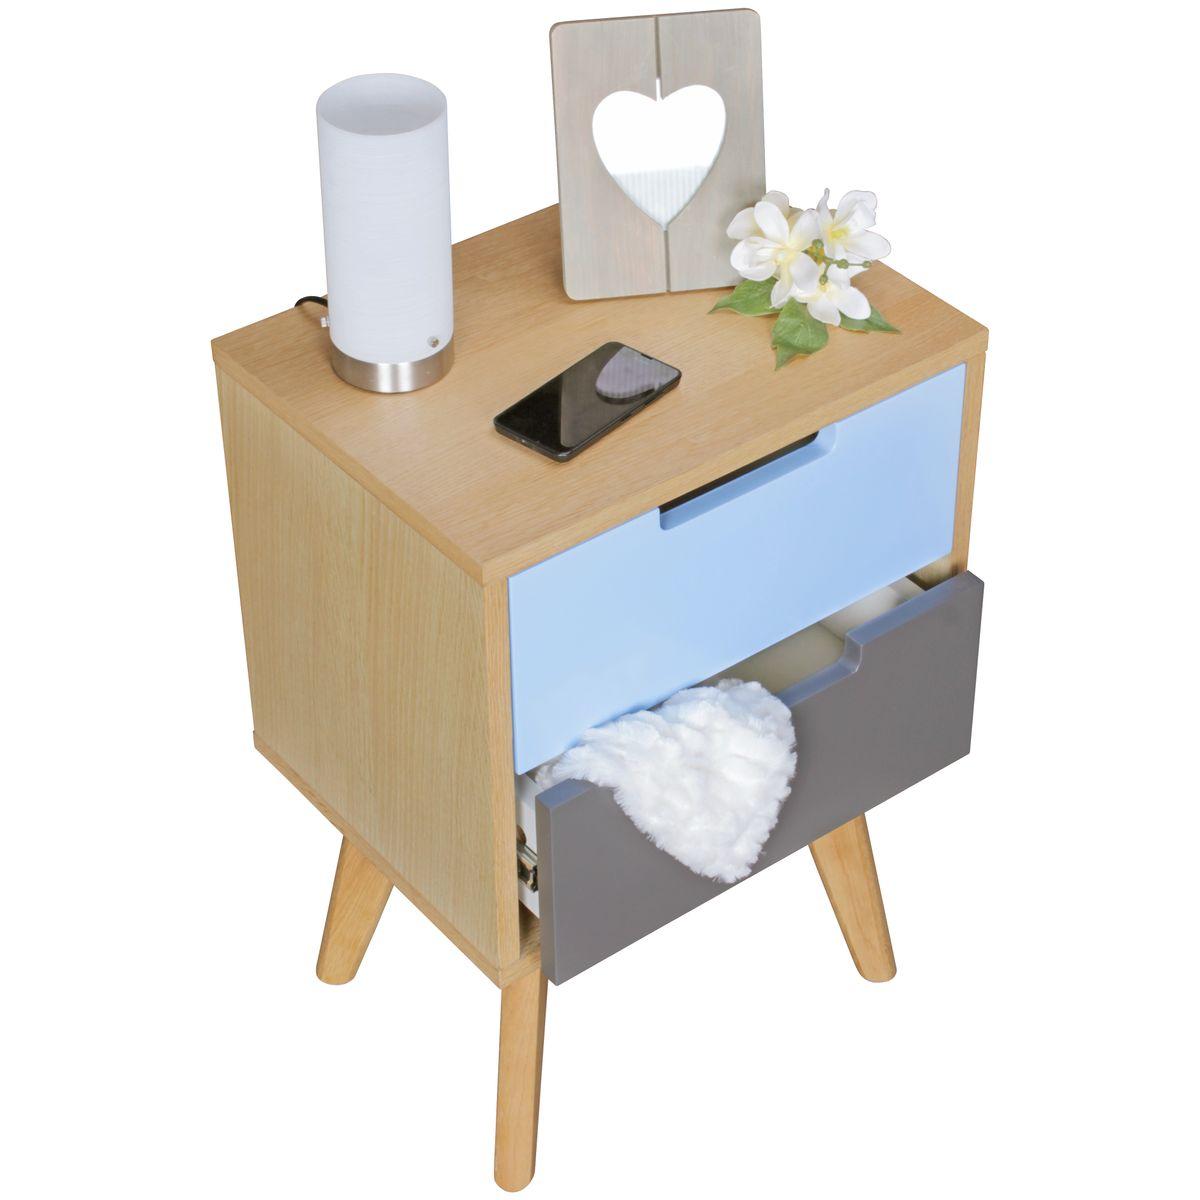 finebuy retro nachtkonsole scanio holz nachttisch. Black Bedroom Furniture Sets. Home Design Ideas